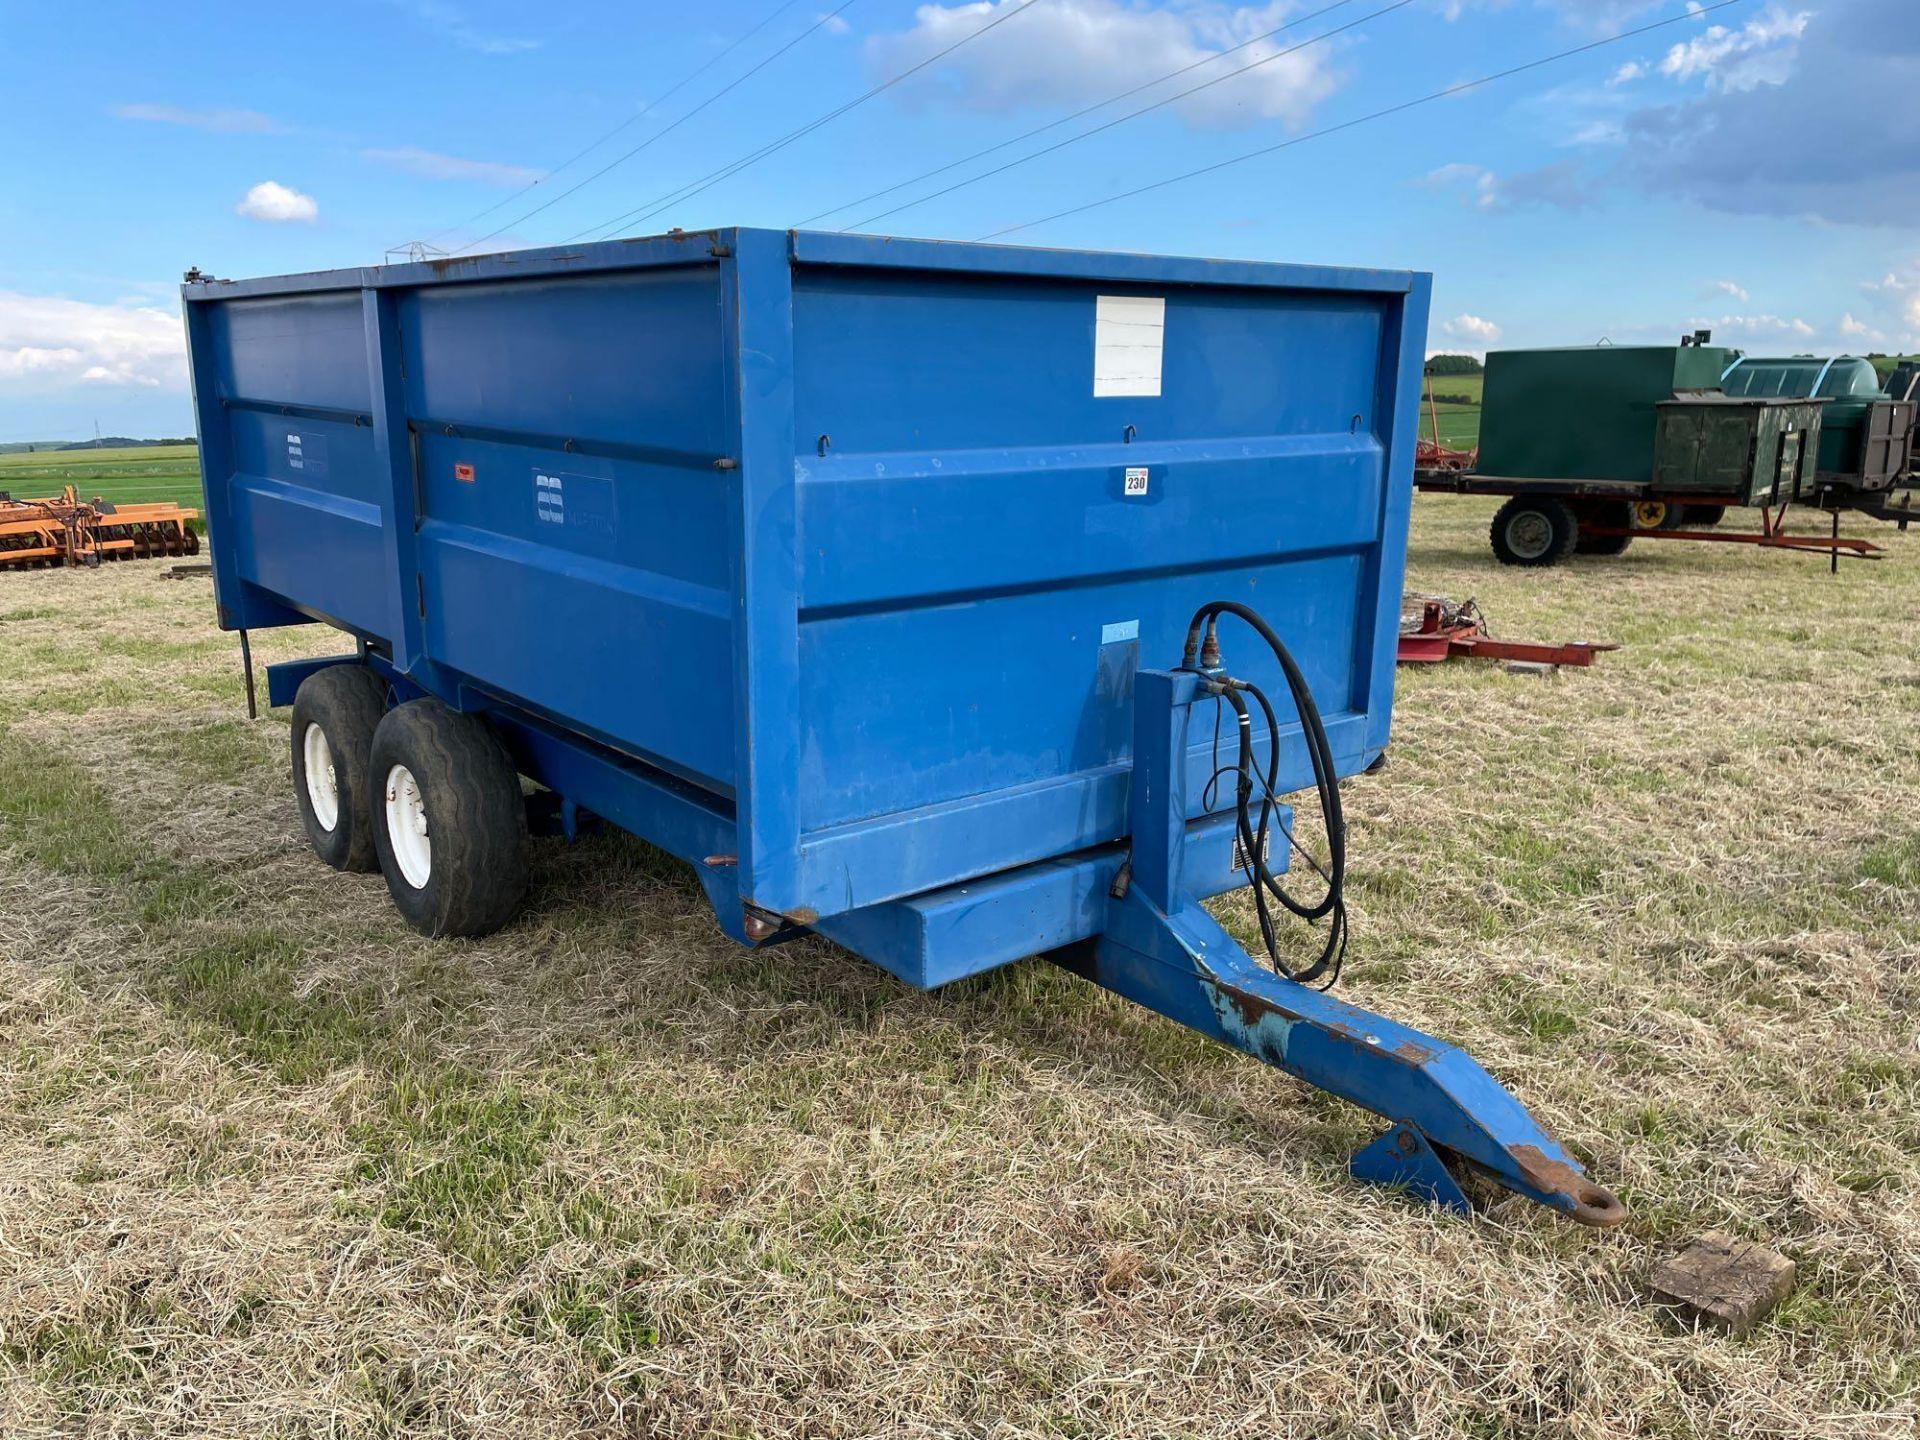 1986 AS Marston 8t twin axle grain trailer, manual tailgate and grain chute on 11.5/80-15.3 wheels a